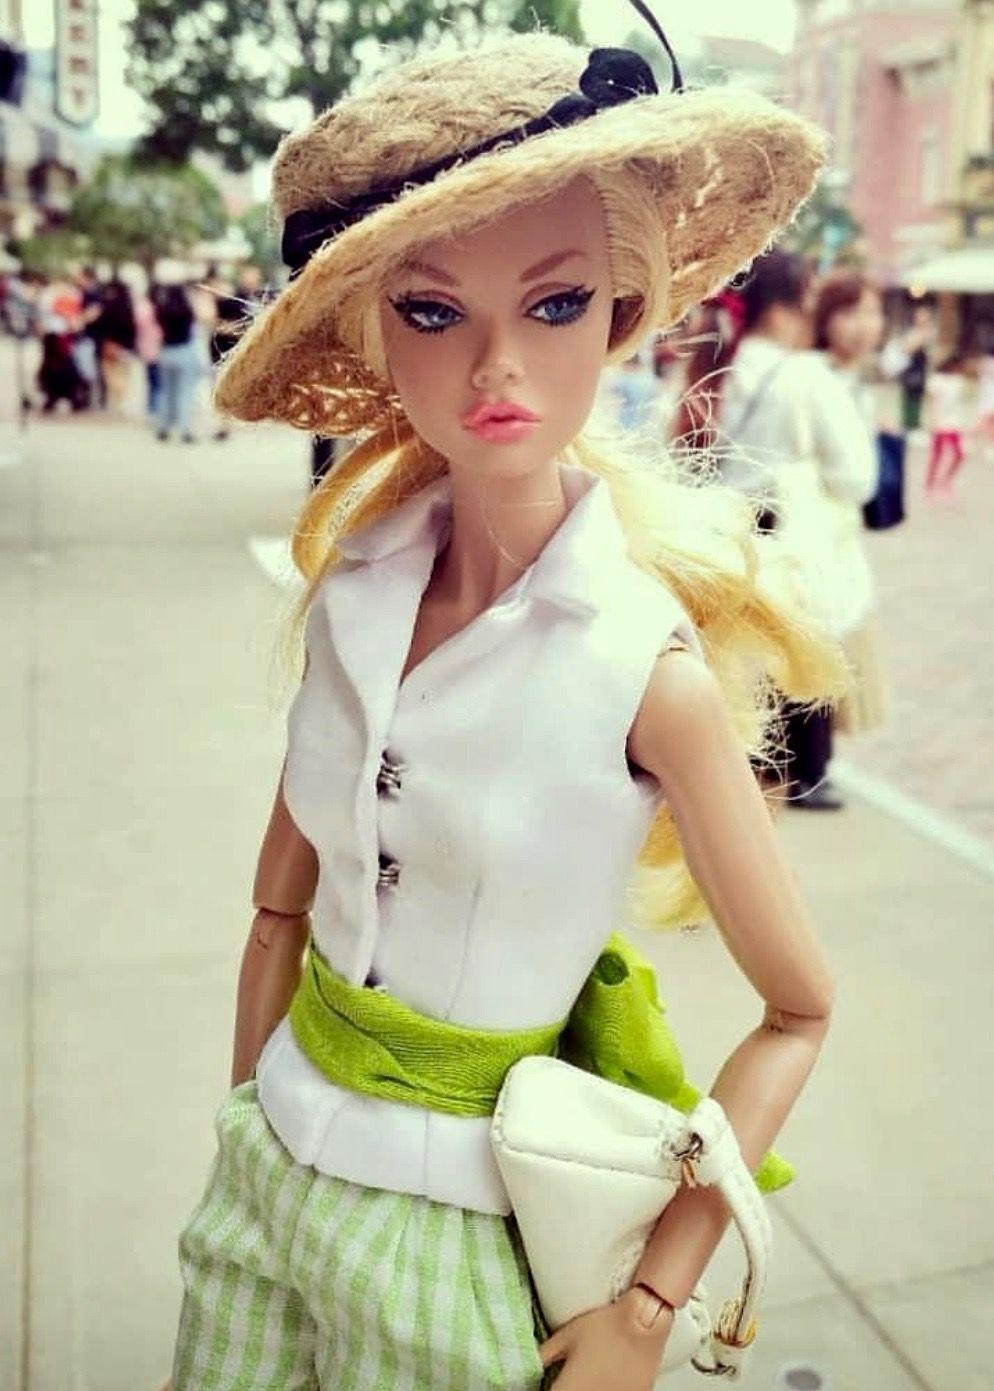 OOAK fashion for Silkstone/Vintage Barbie & Fashion